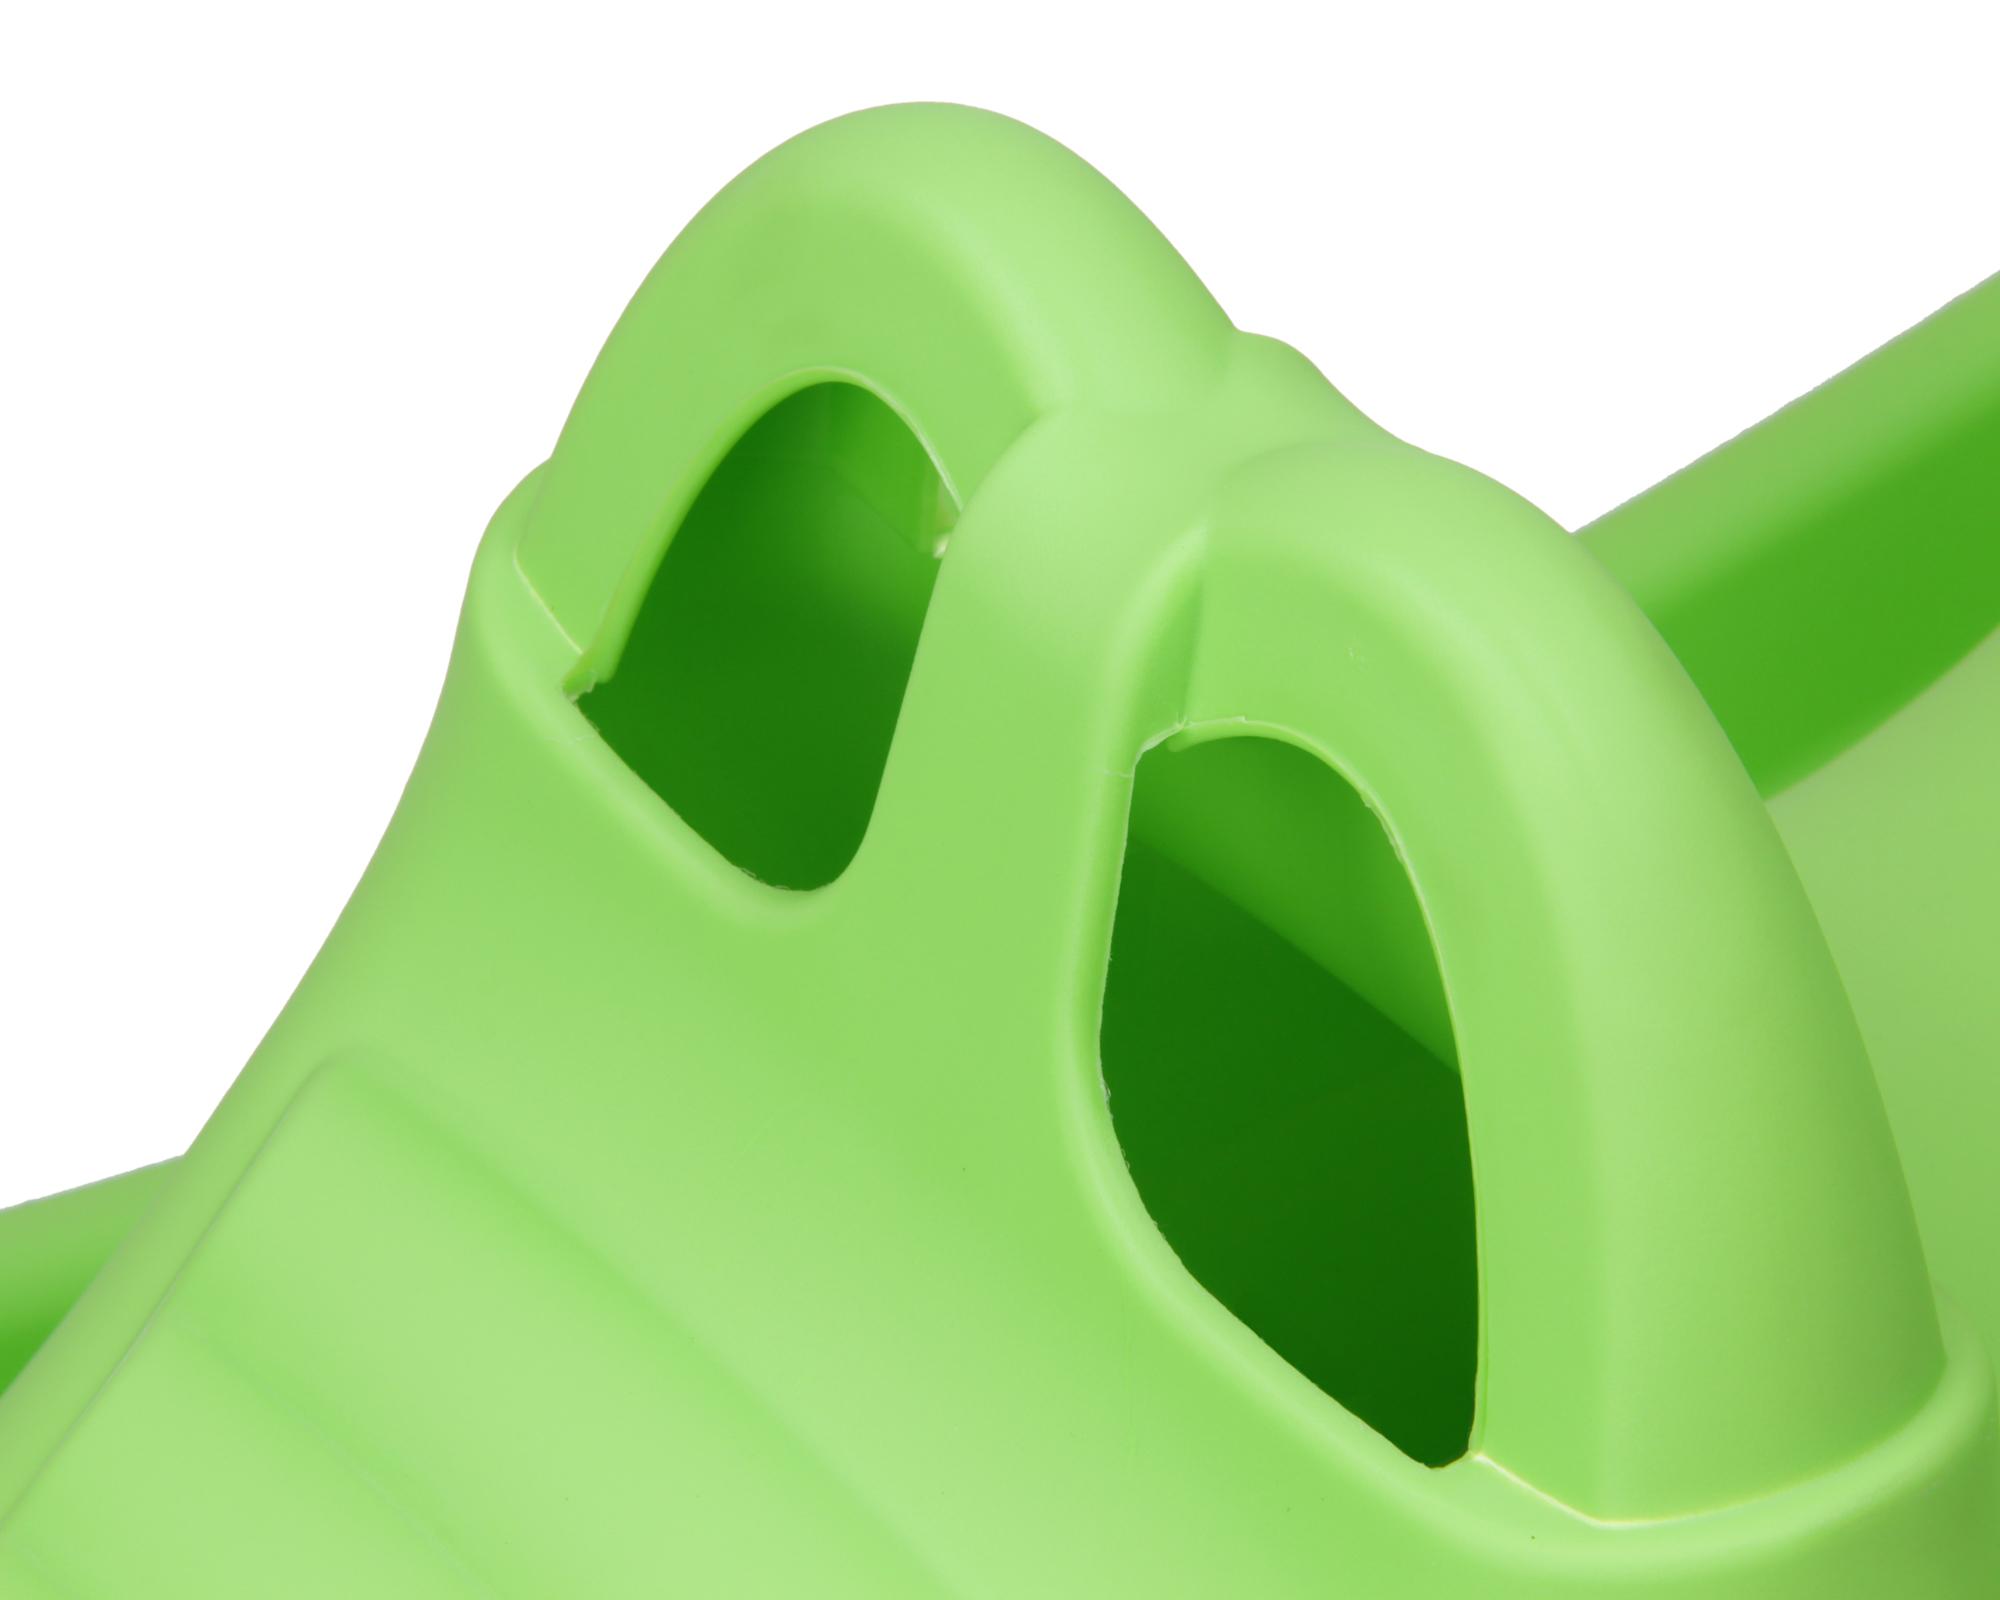 ondis24 kinderwippe babywippe schaukel krokodil gr n g nstig online kaufen. Black Bedroom Furniture Sets. Home Design Ideas